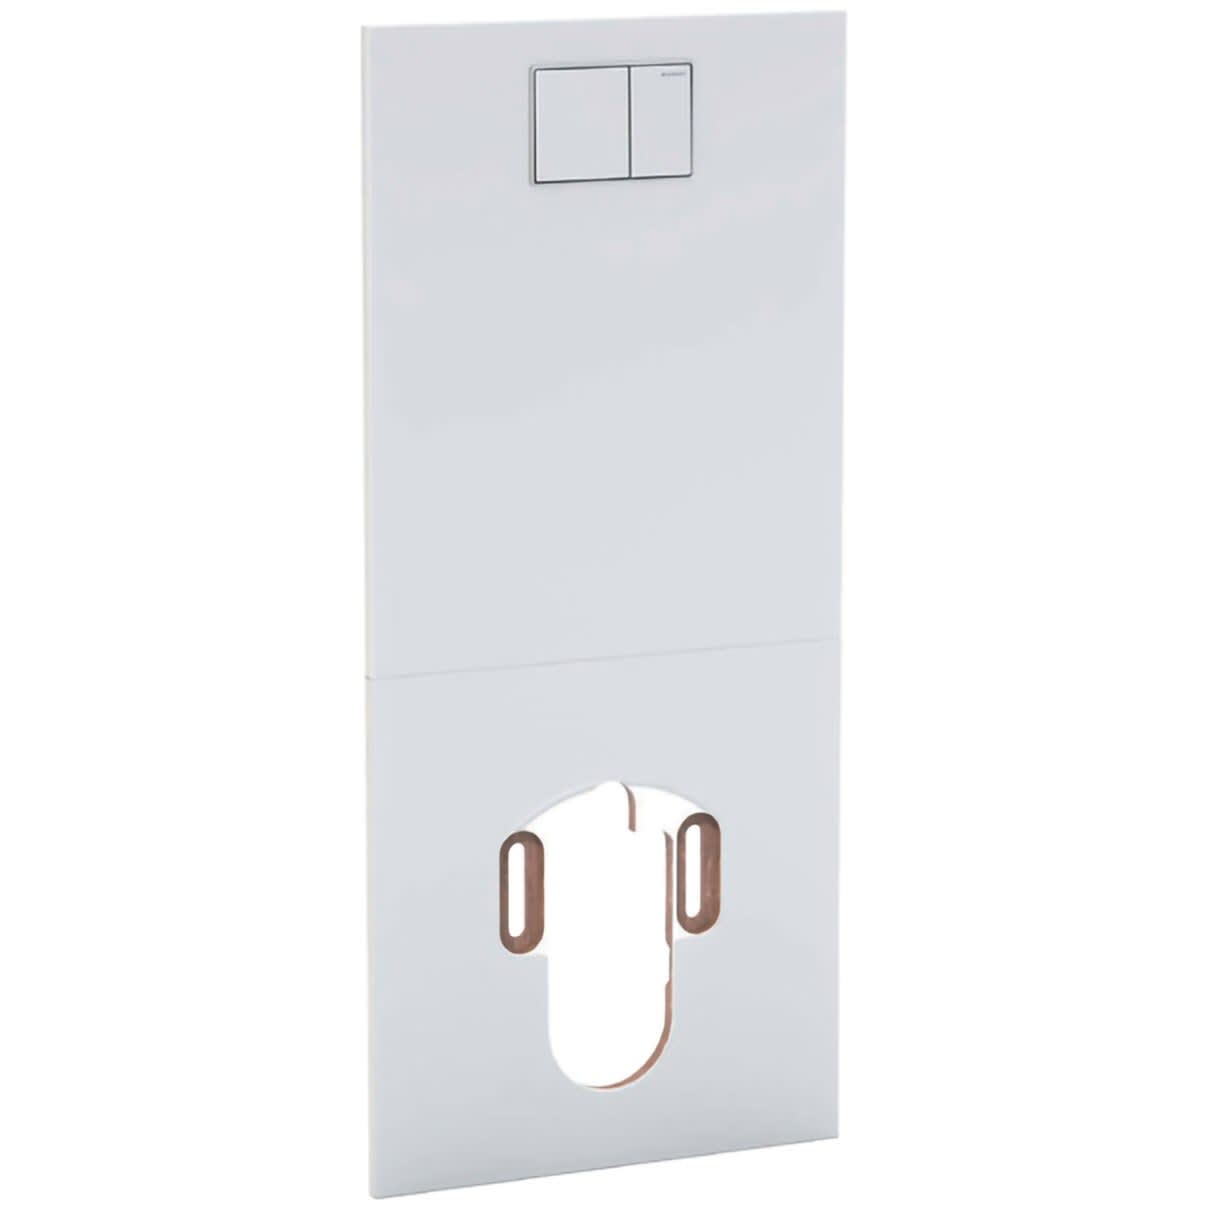 Geberit Designplatte Fur Geberit Aquaclean Sela Hochdruck